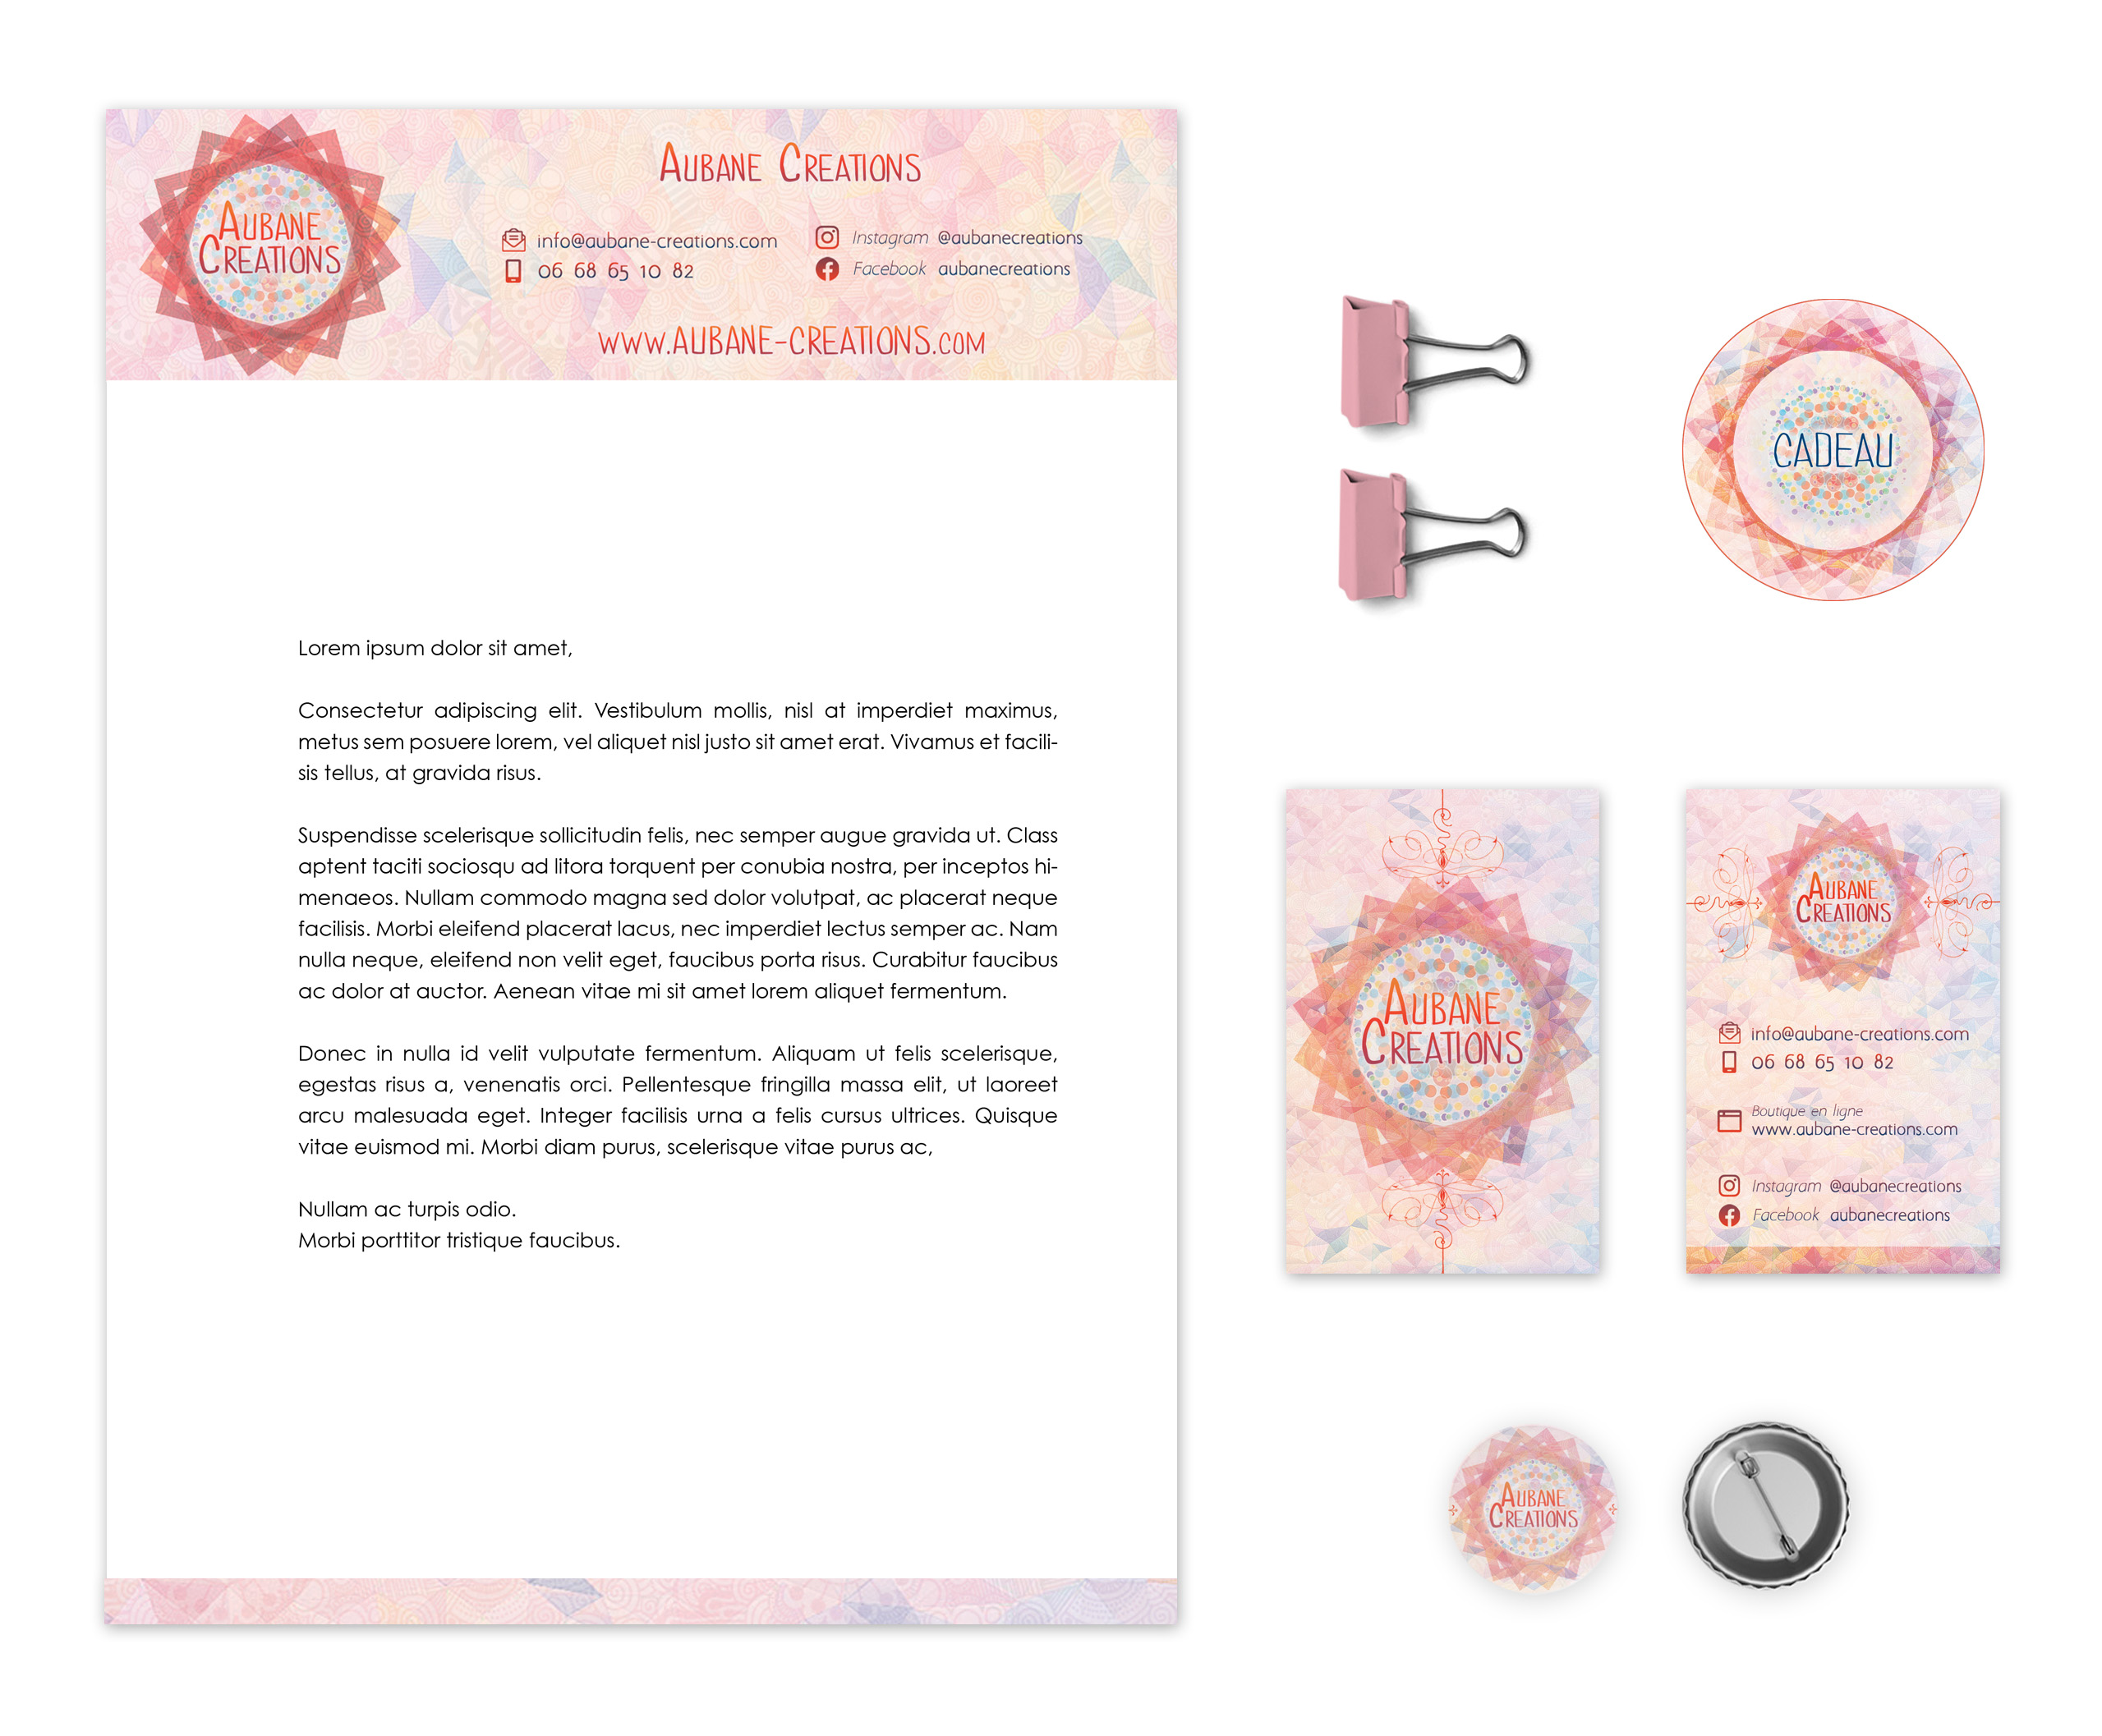 Aubane Creations - Print